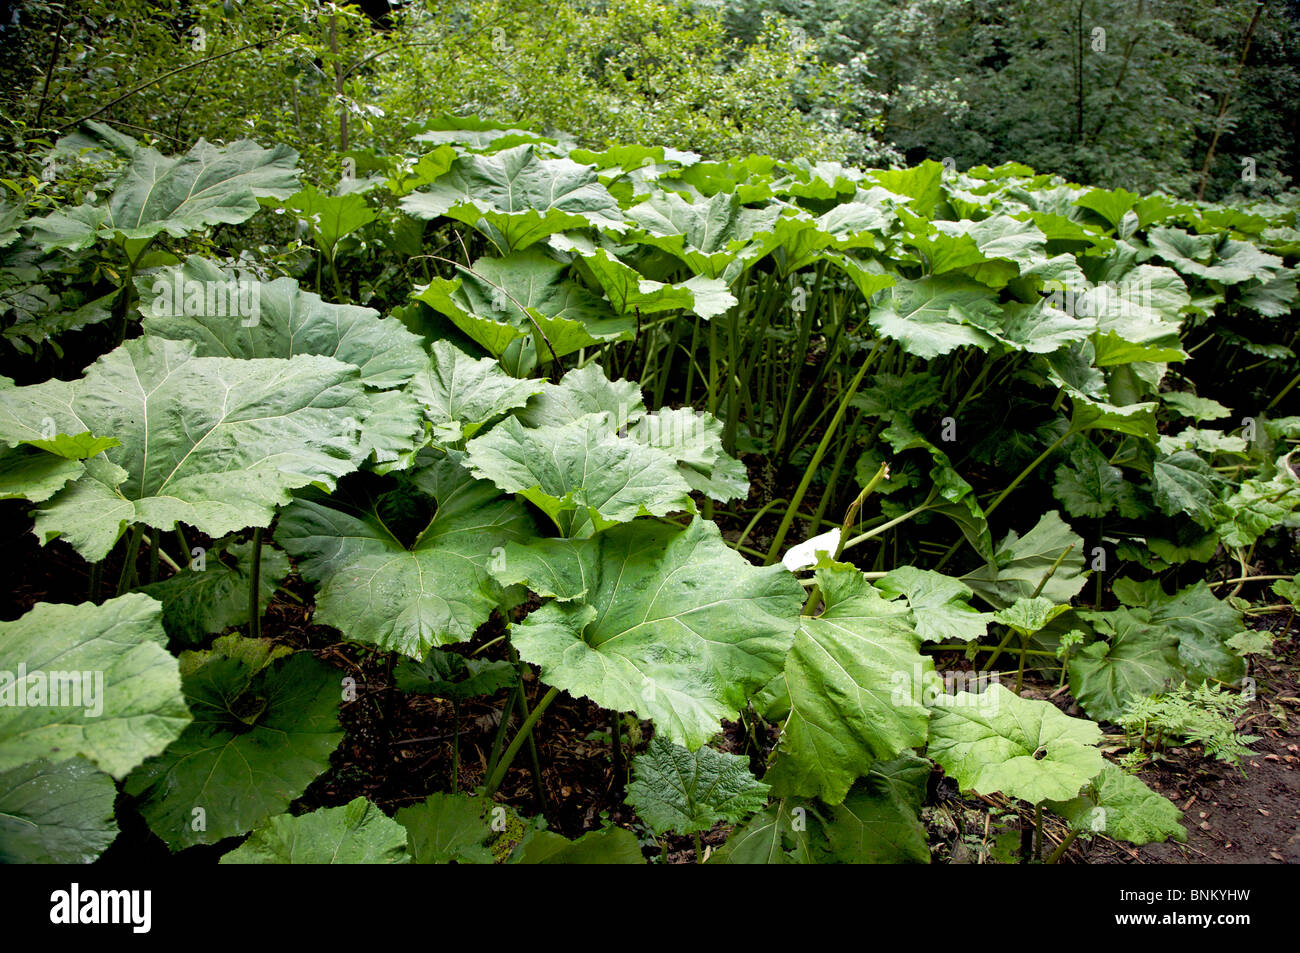 large gunnera plants Stock Photo Royalty Free Image 30556901 Alamy